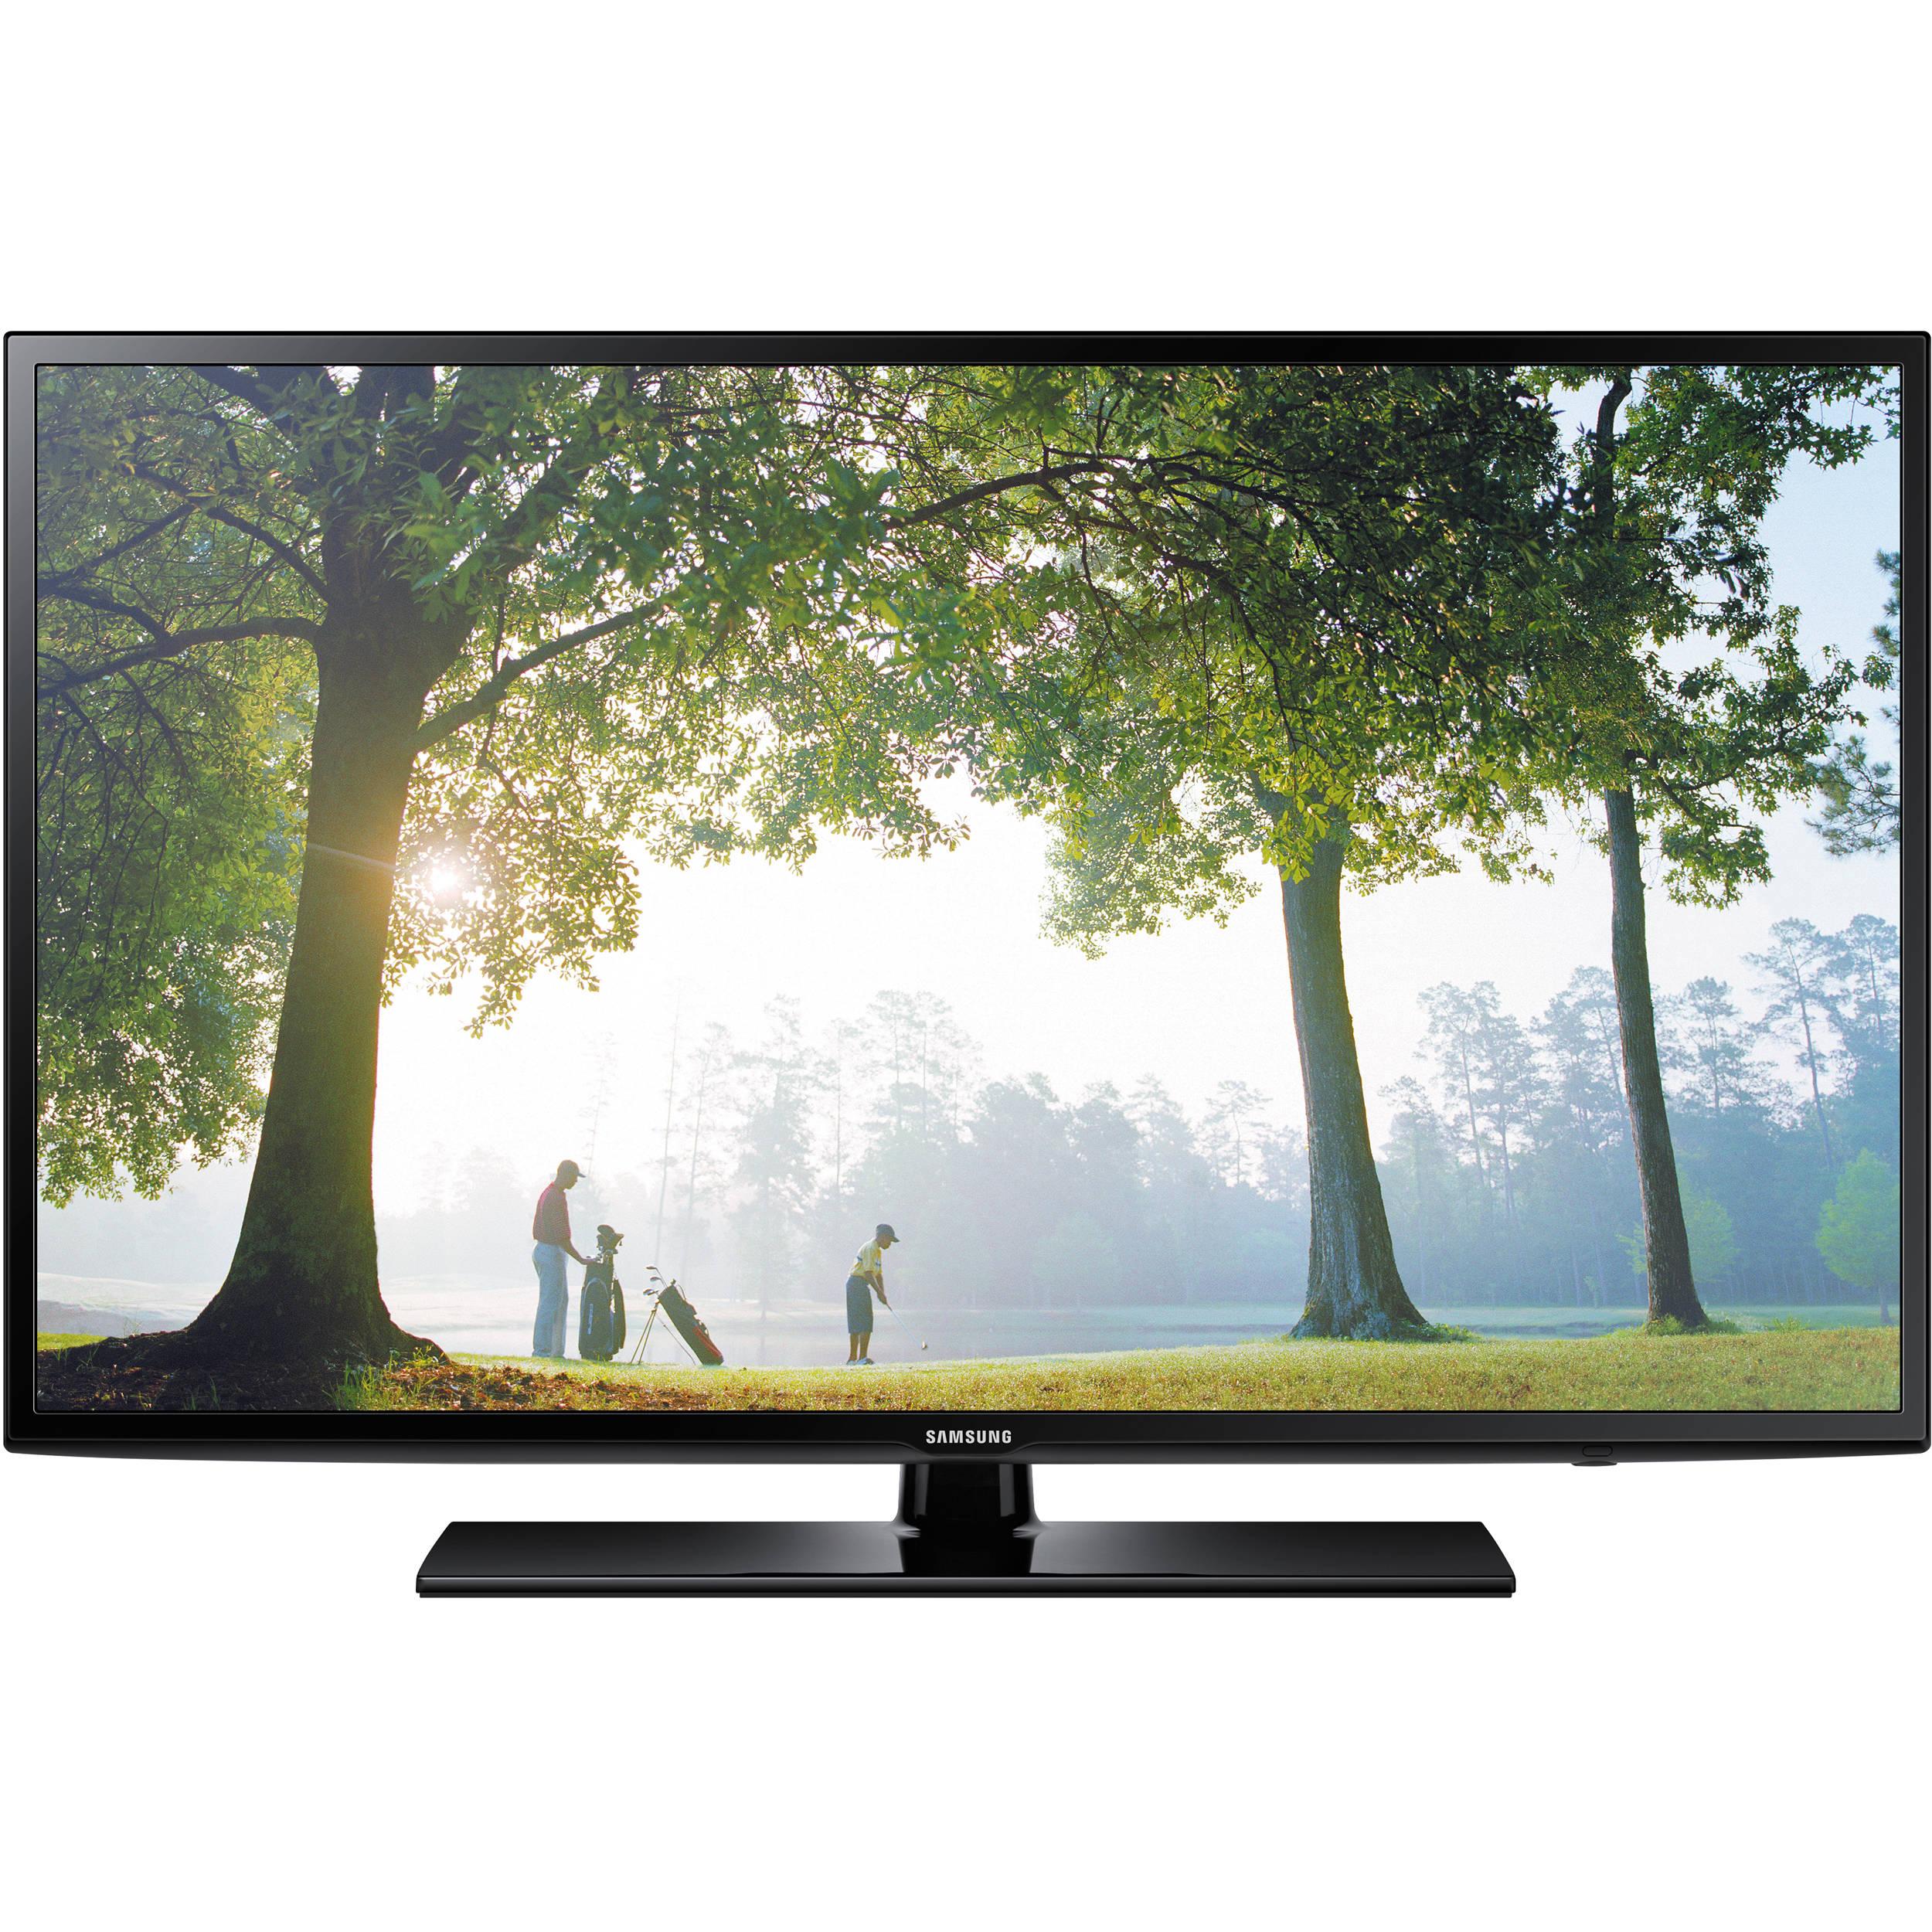 Samsung H6203 Series 55 Class Full Hd Smart Un55h6203afxza # Modele De Table Television